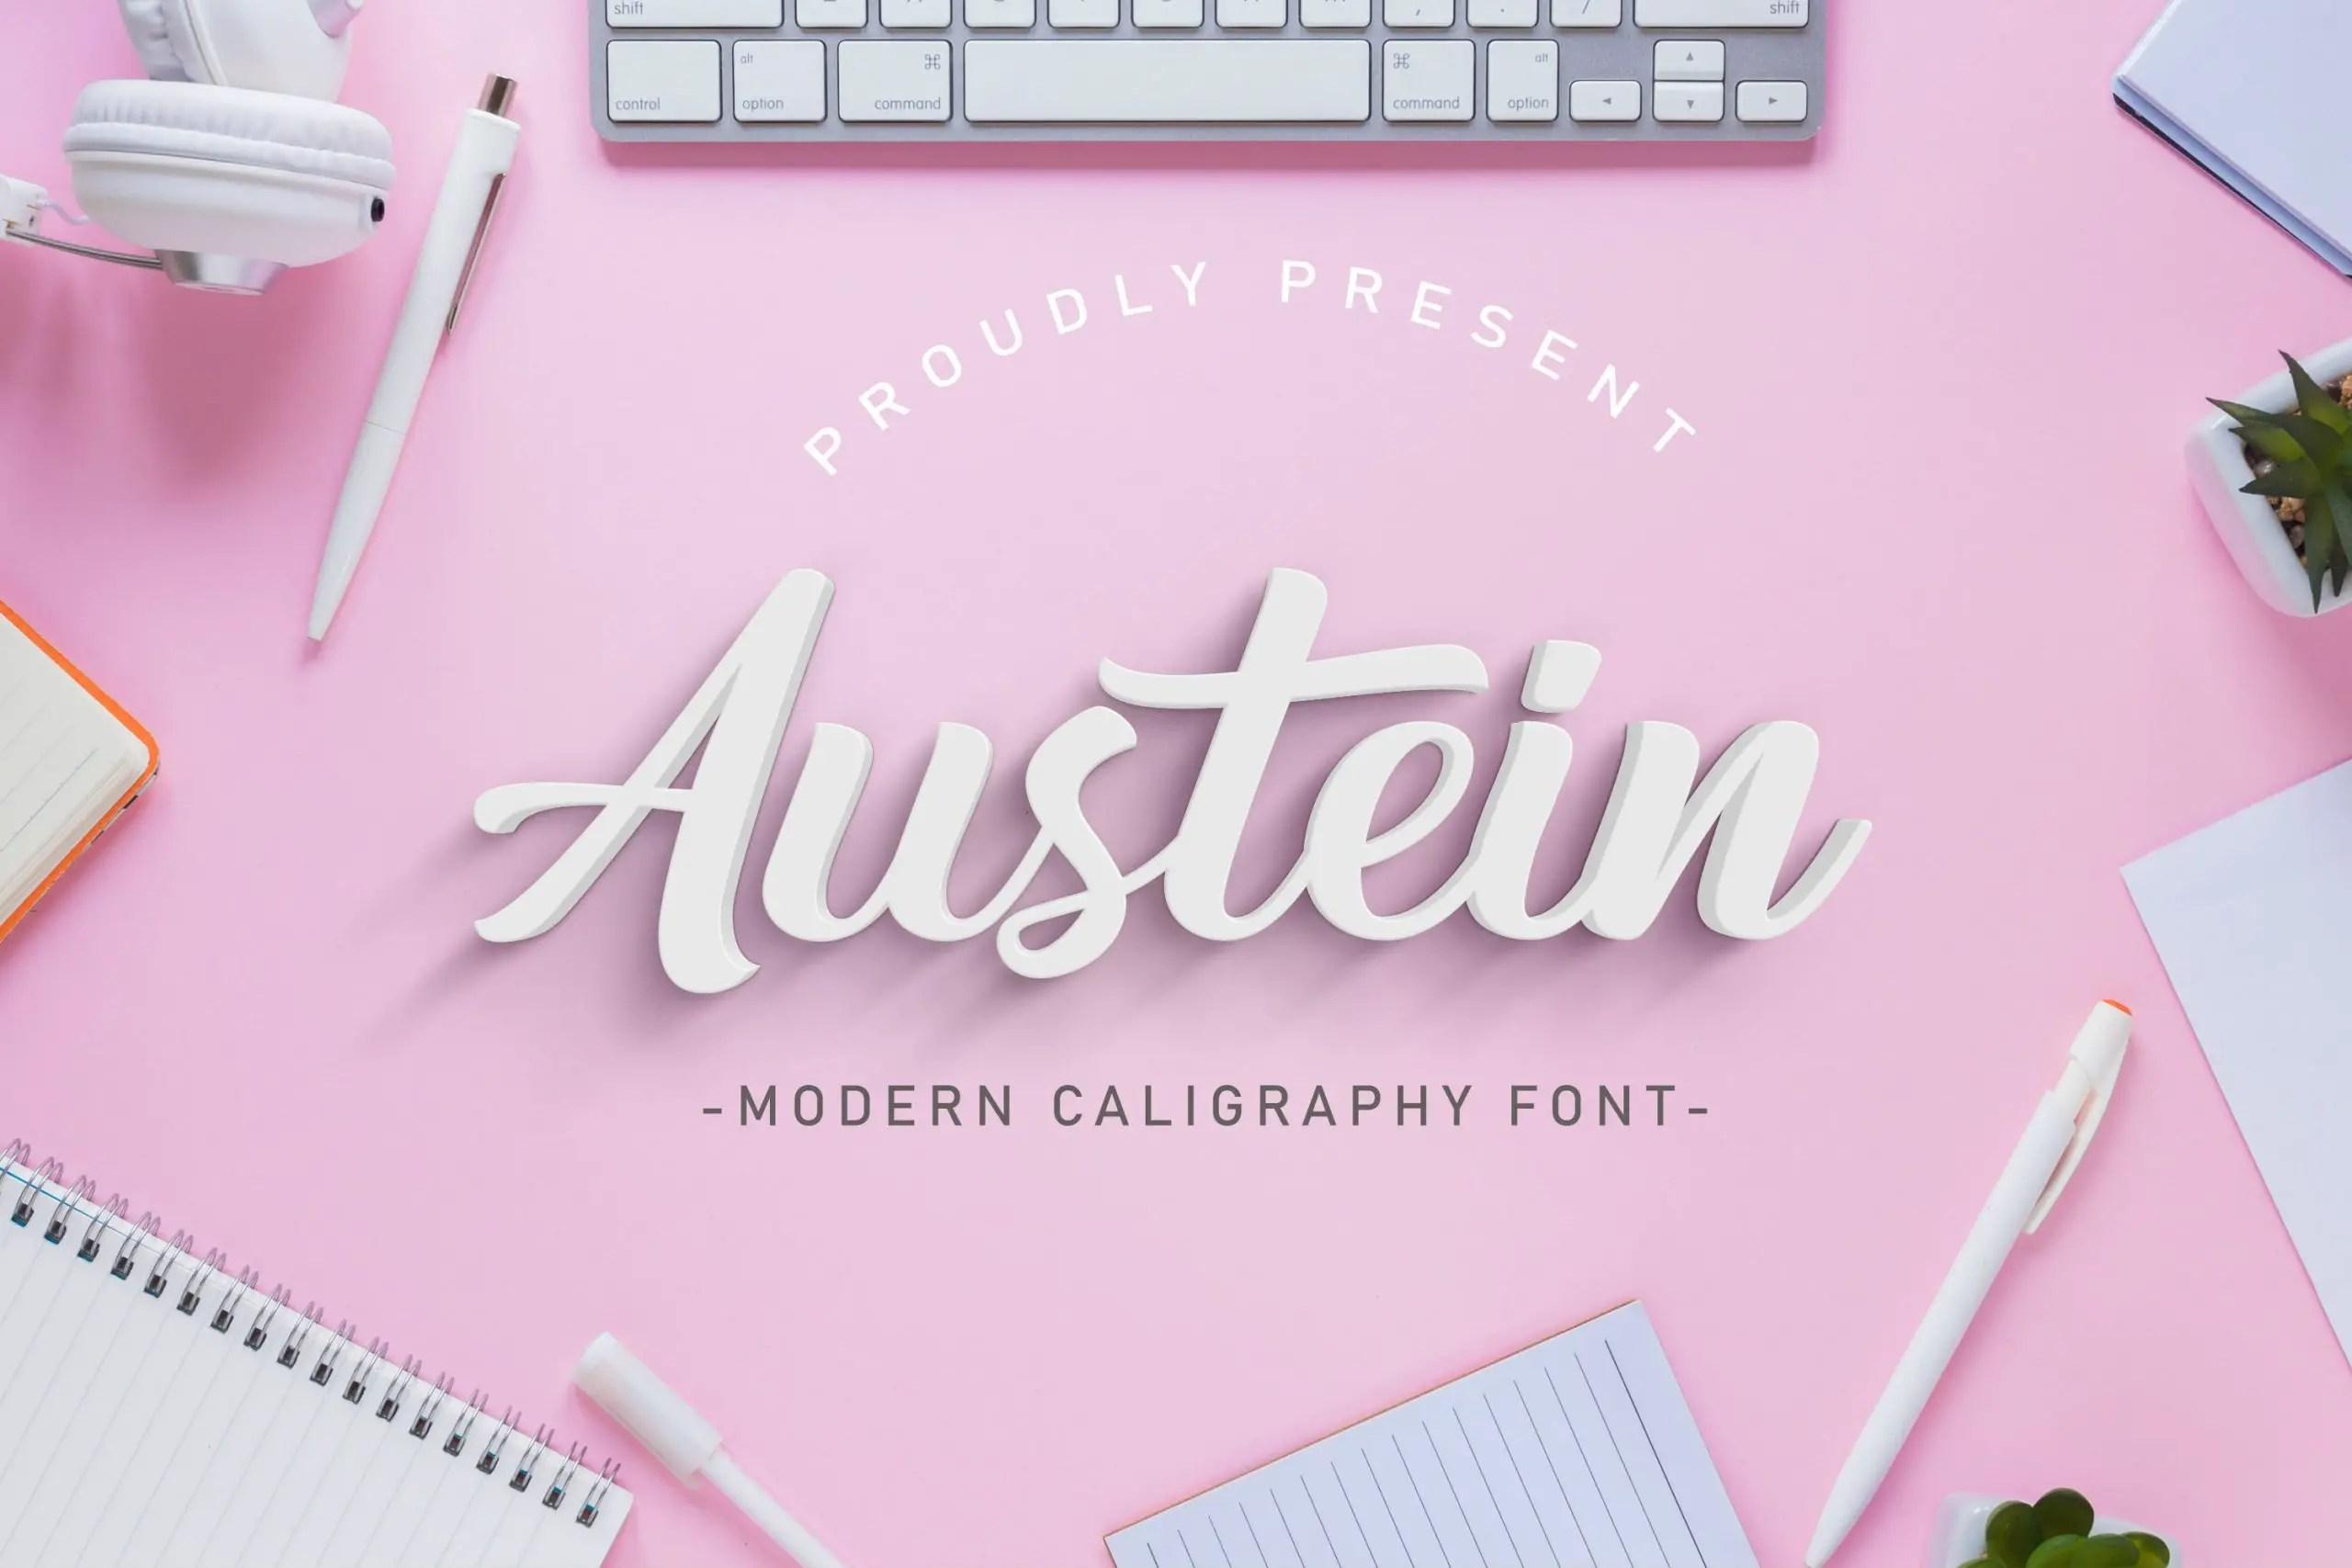 Austein Calligraphy Script Font-1